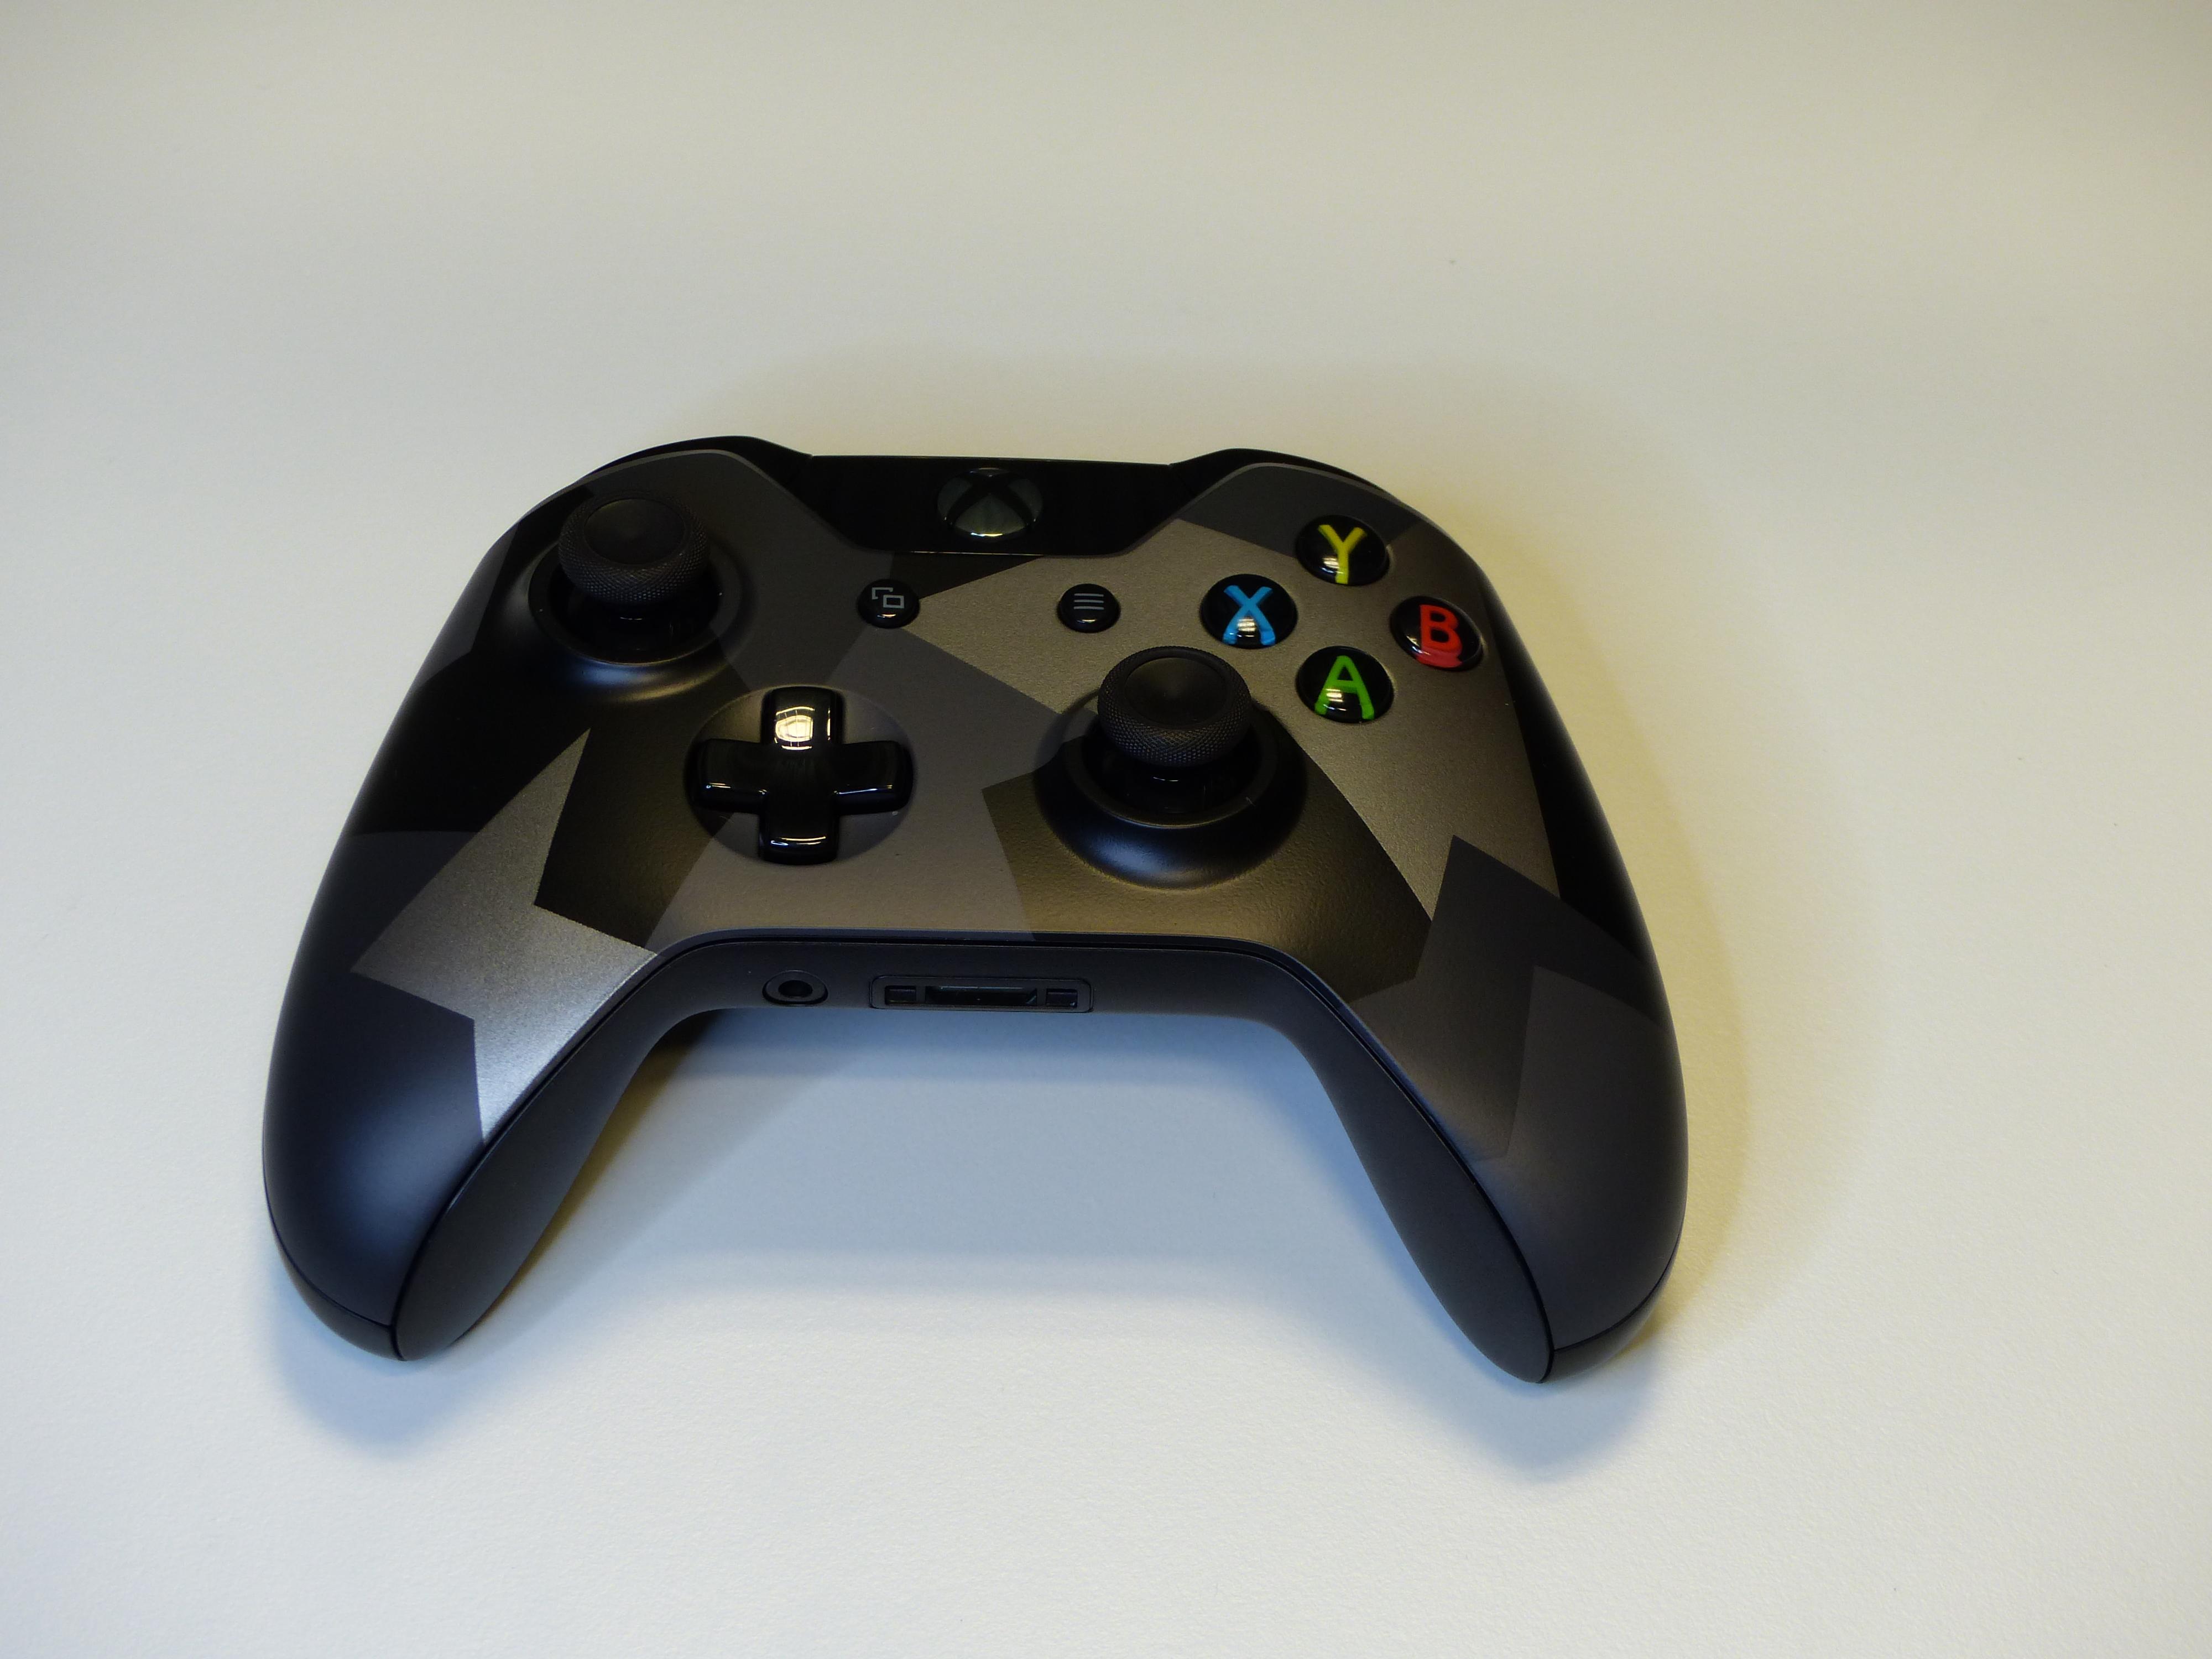 Xbox 360 Headset Wiring Diagram Furthermore Xbox 360 Parts Diagram